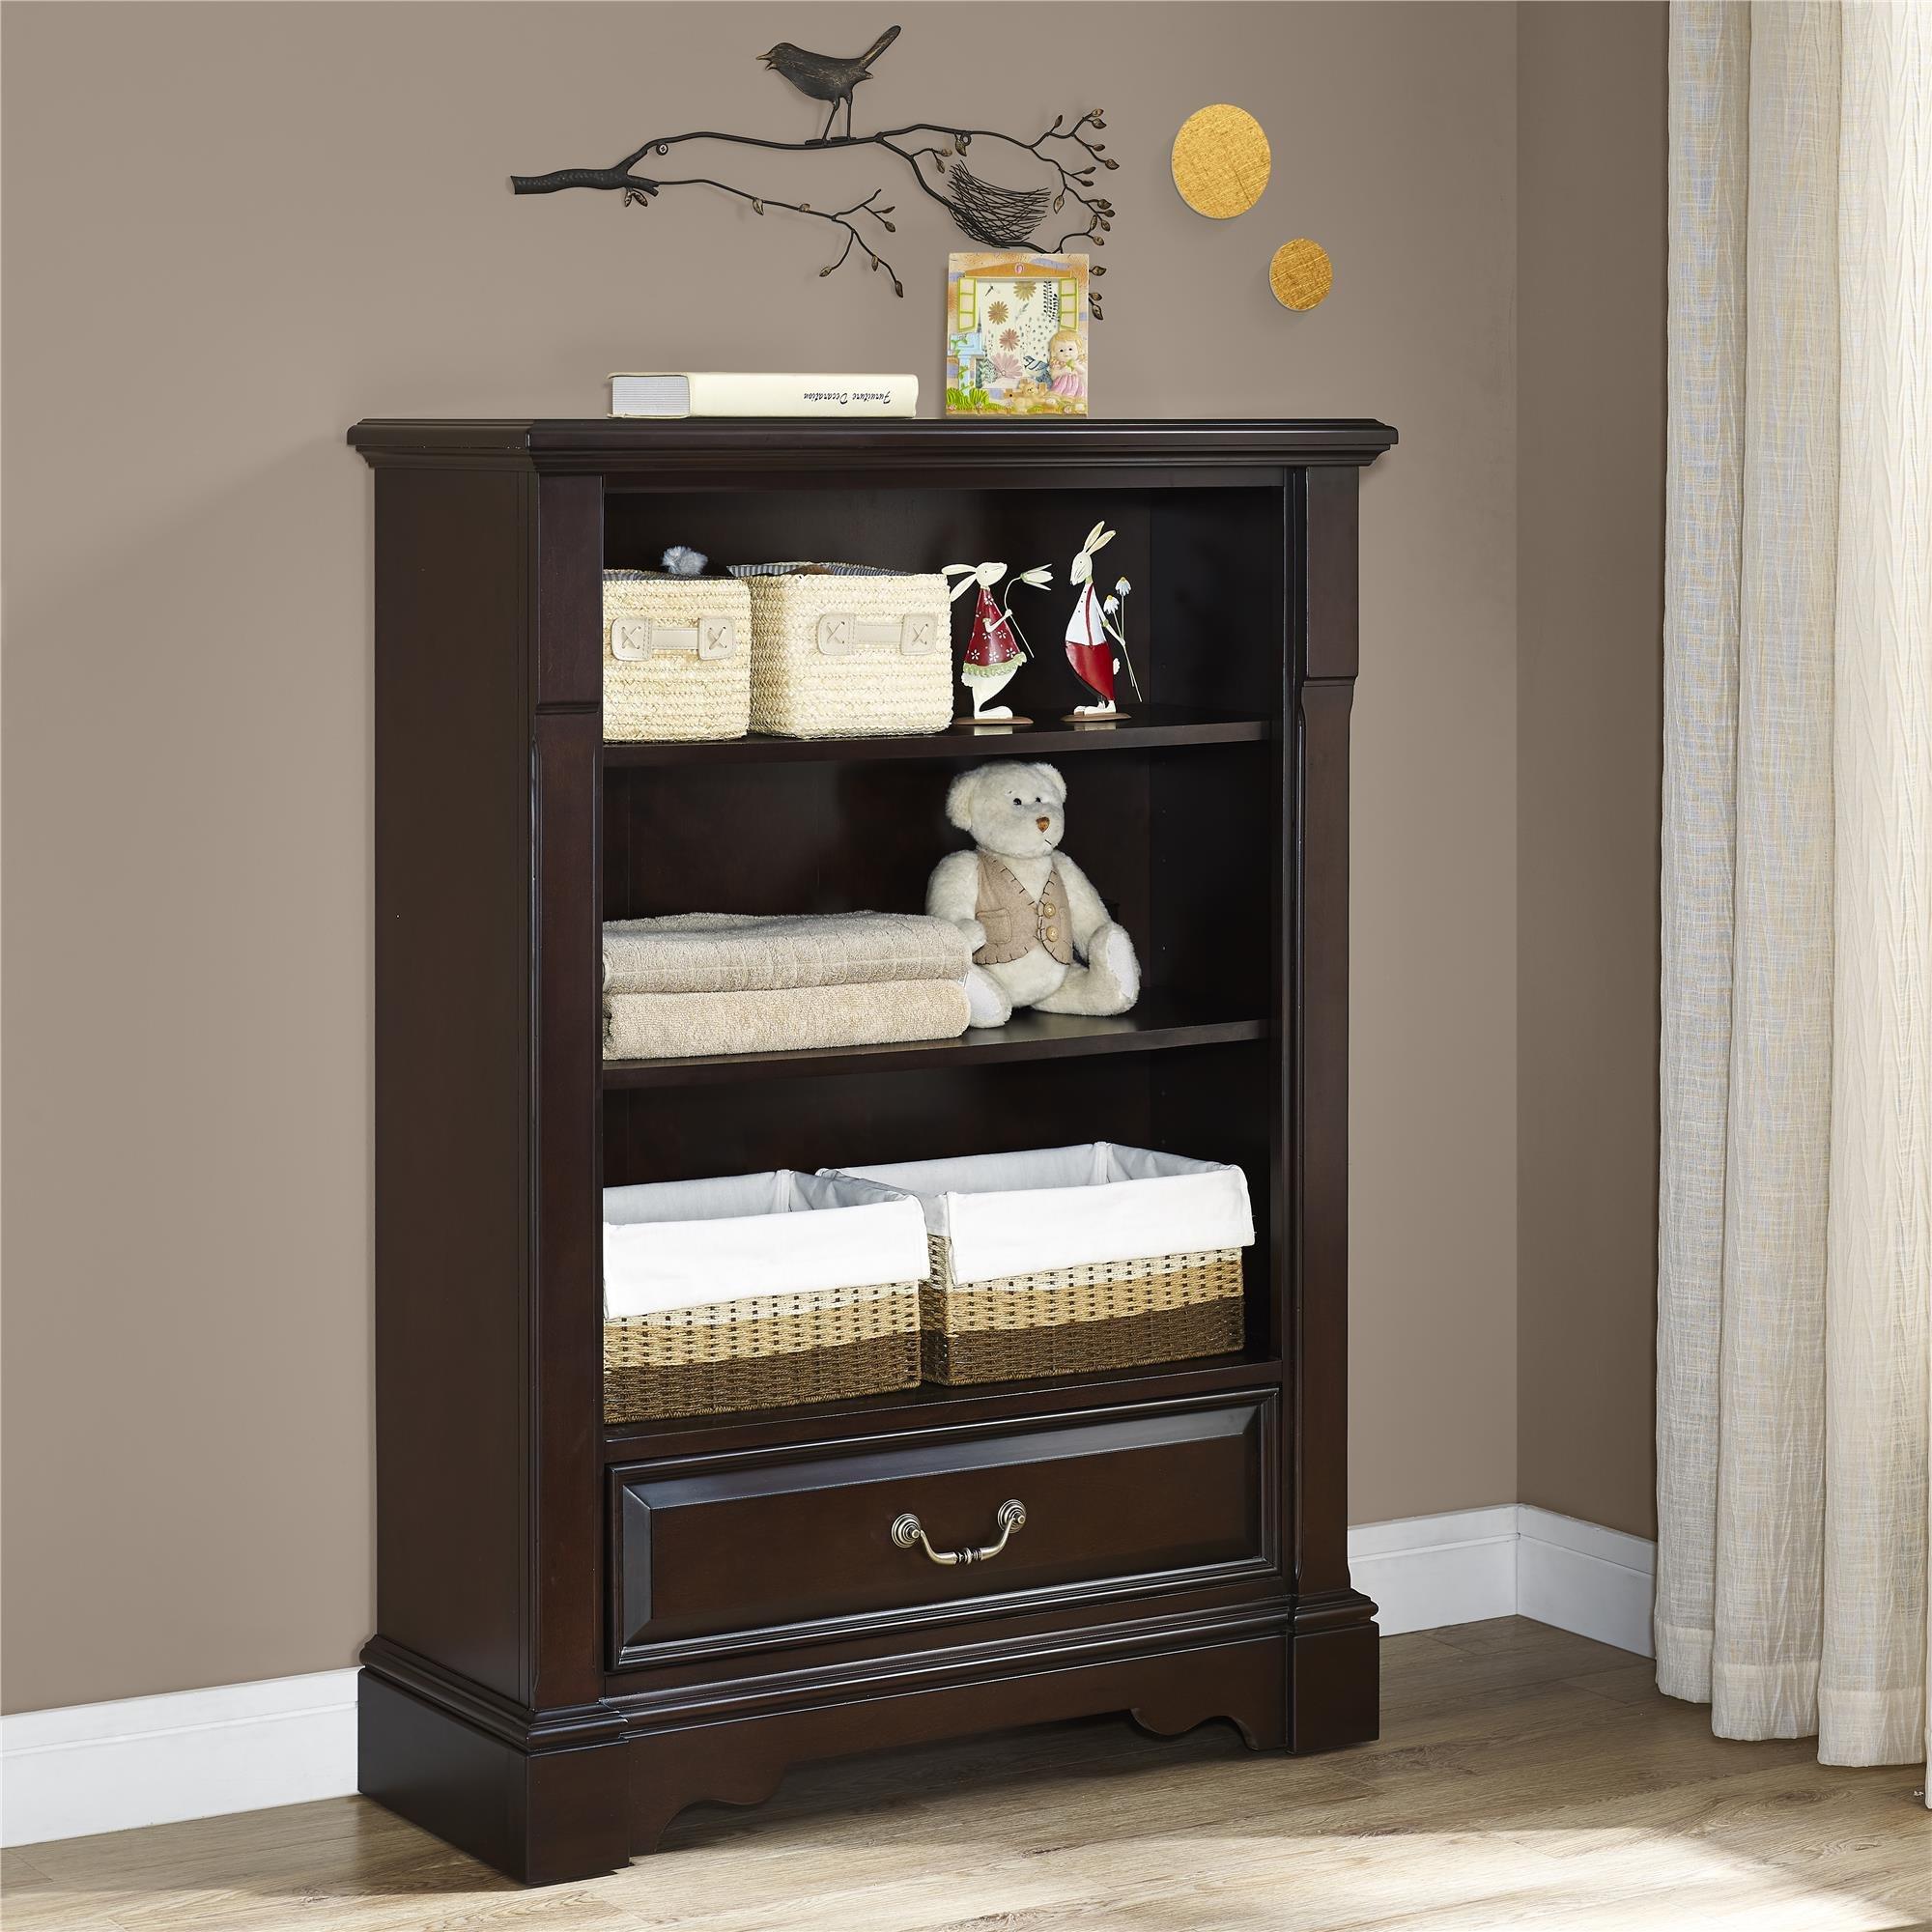 Baby Knightly Mirabel Bookcase, Espresso